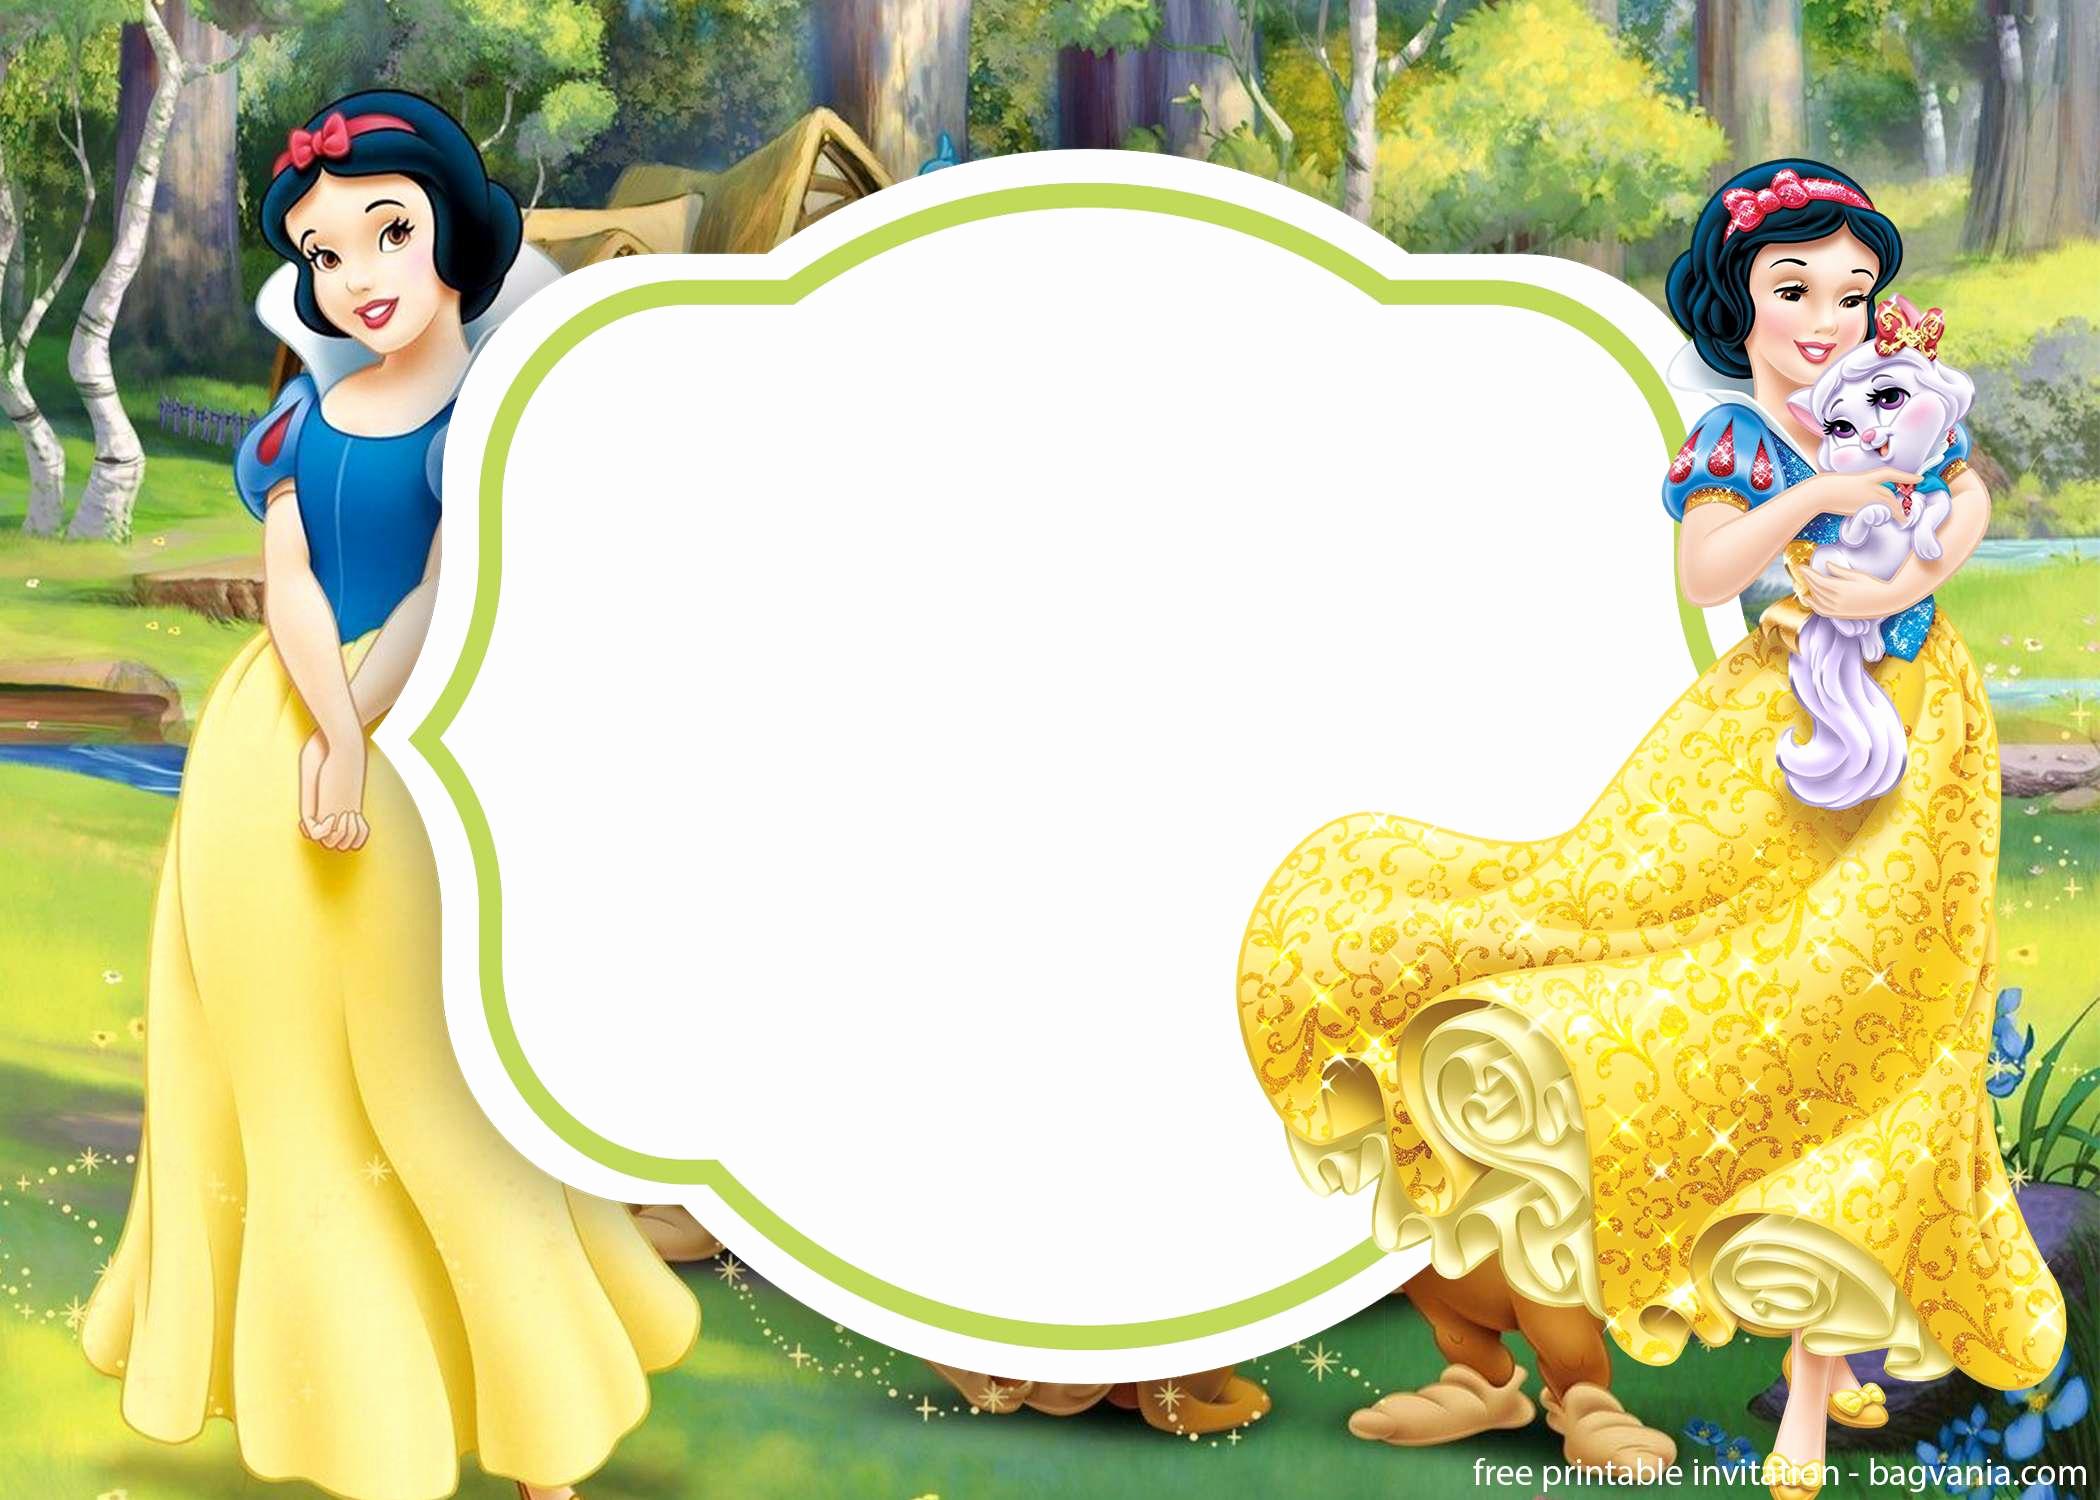 Snow White Invitation Template Inspirational Free Cute Snow White Invitation Template – Free Printable